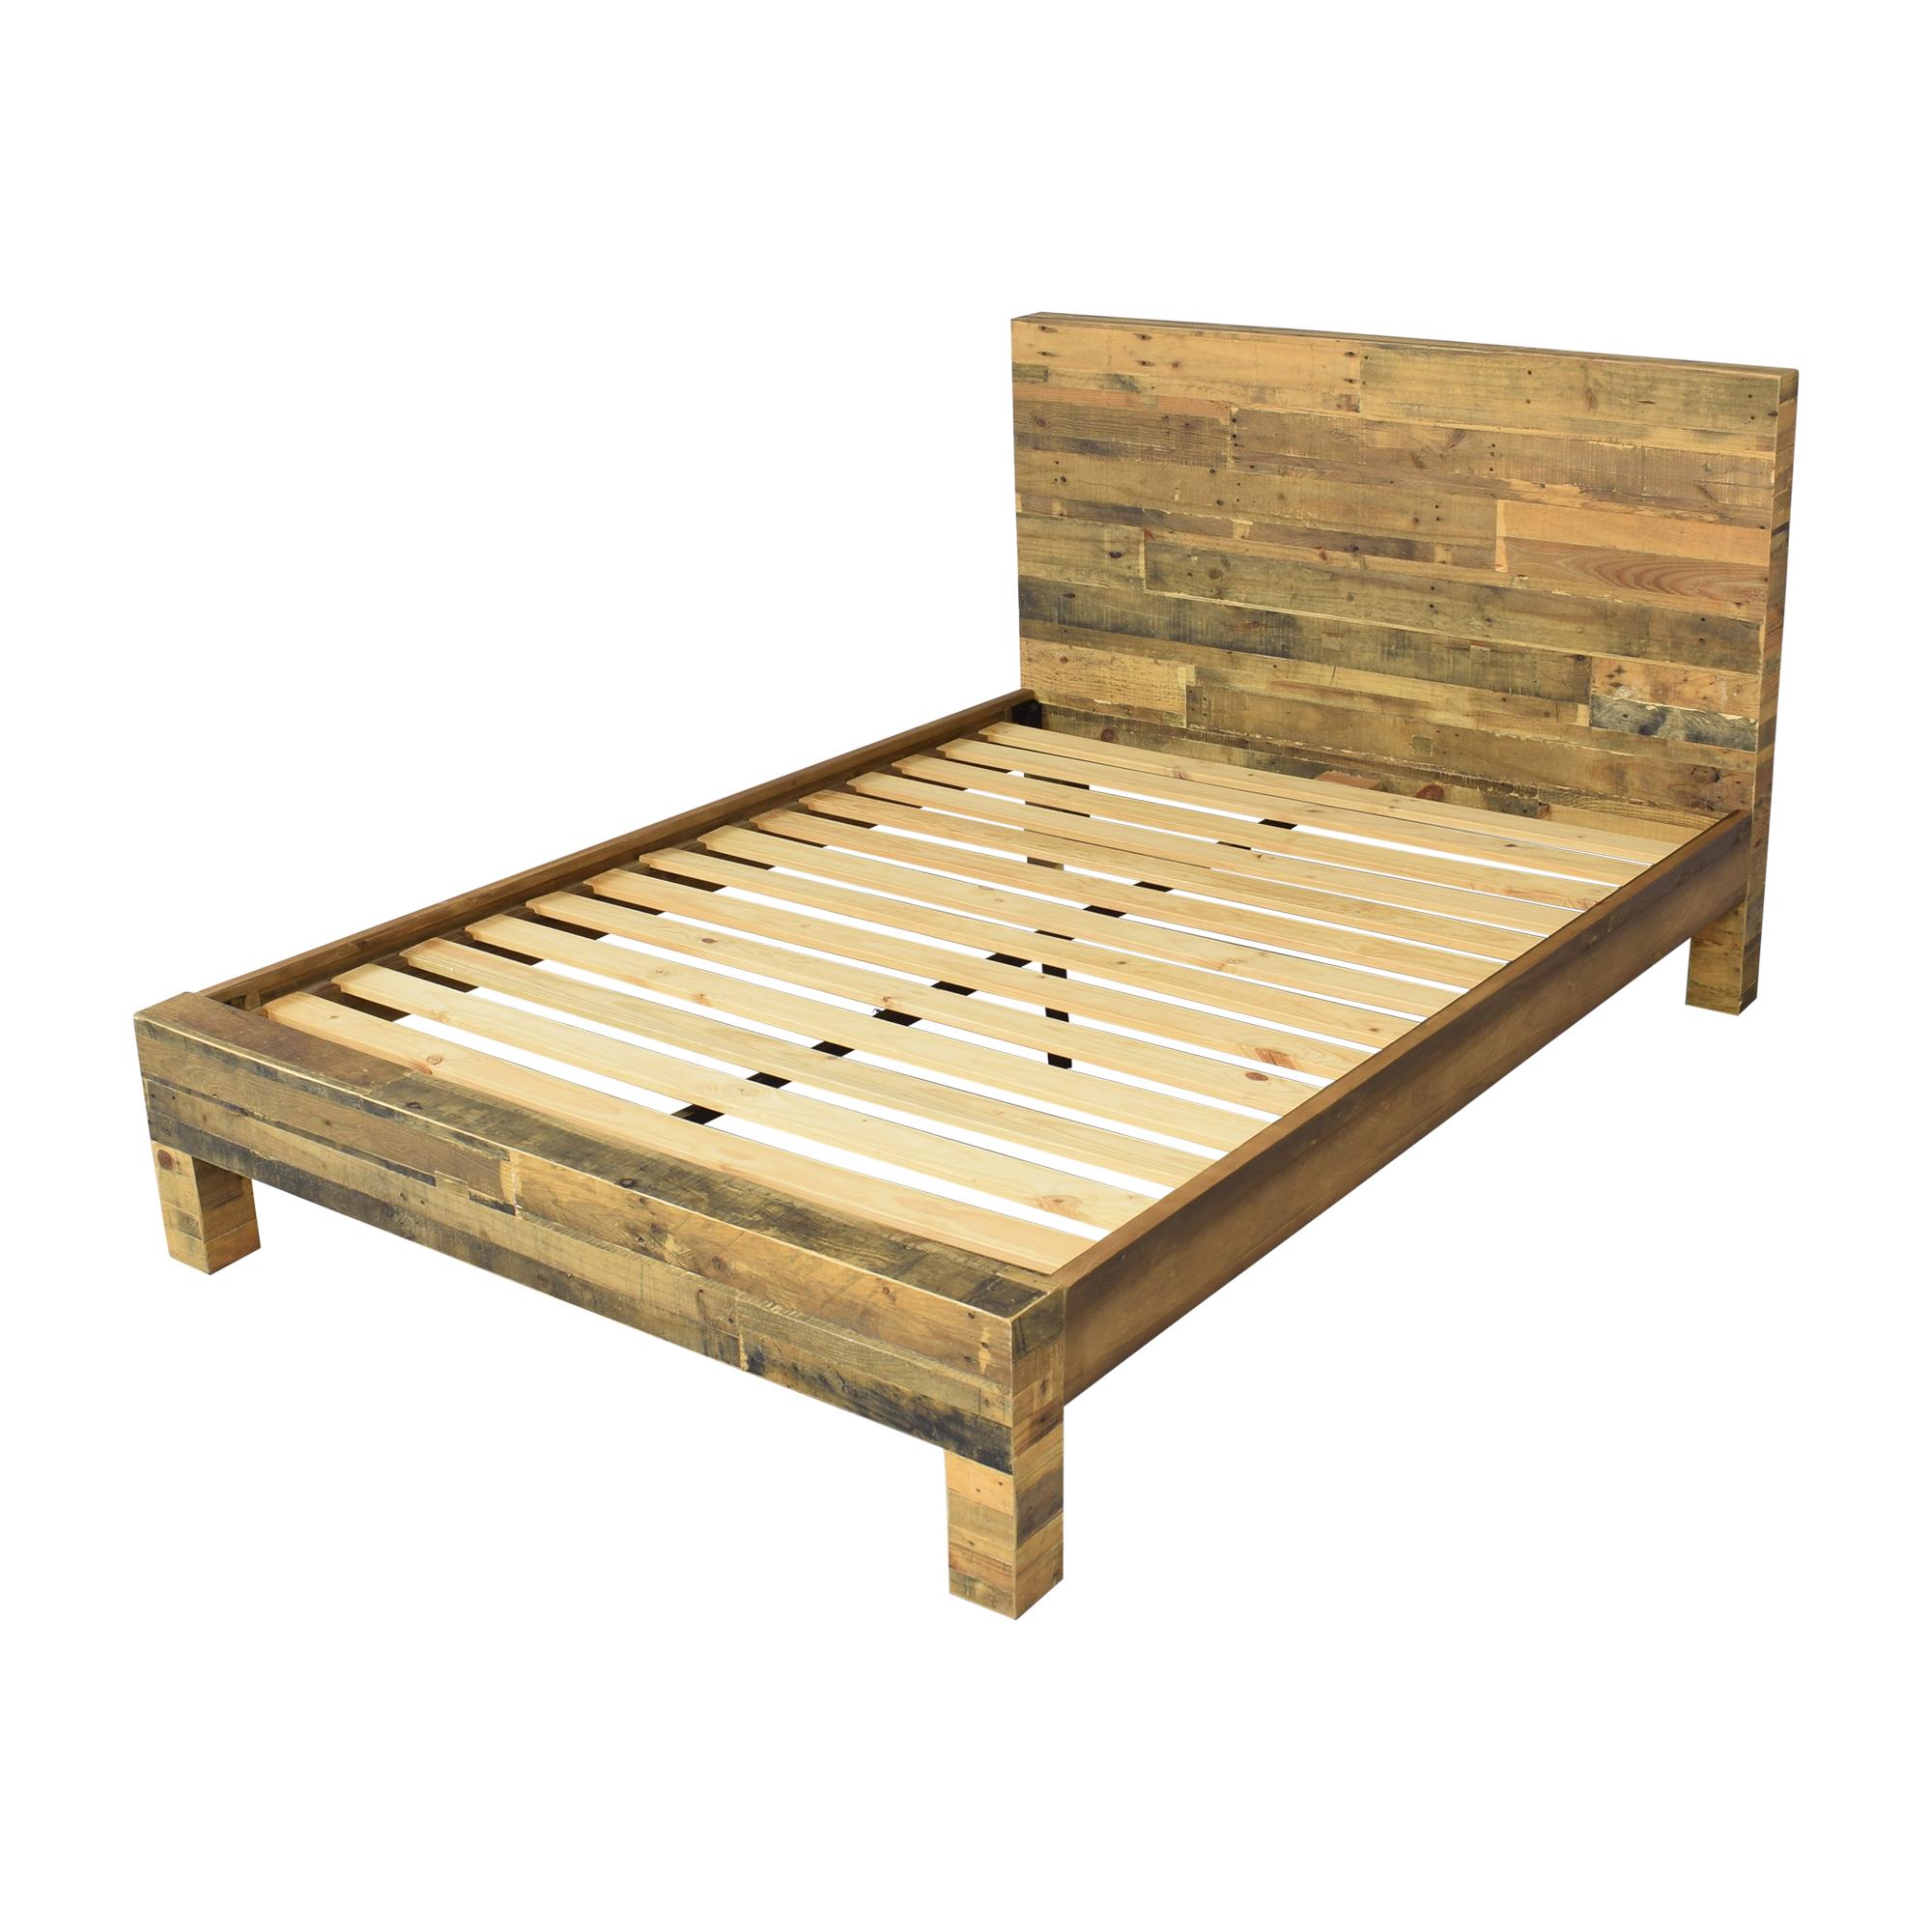 West Elm West Elm Emmerson Reclaimed Queen Bed Frame price